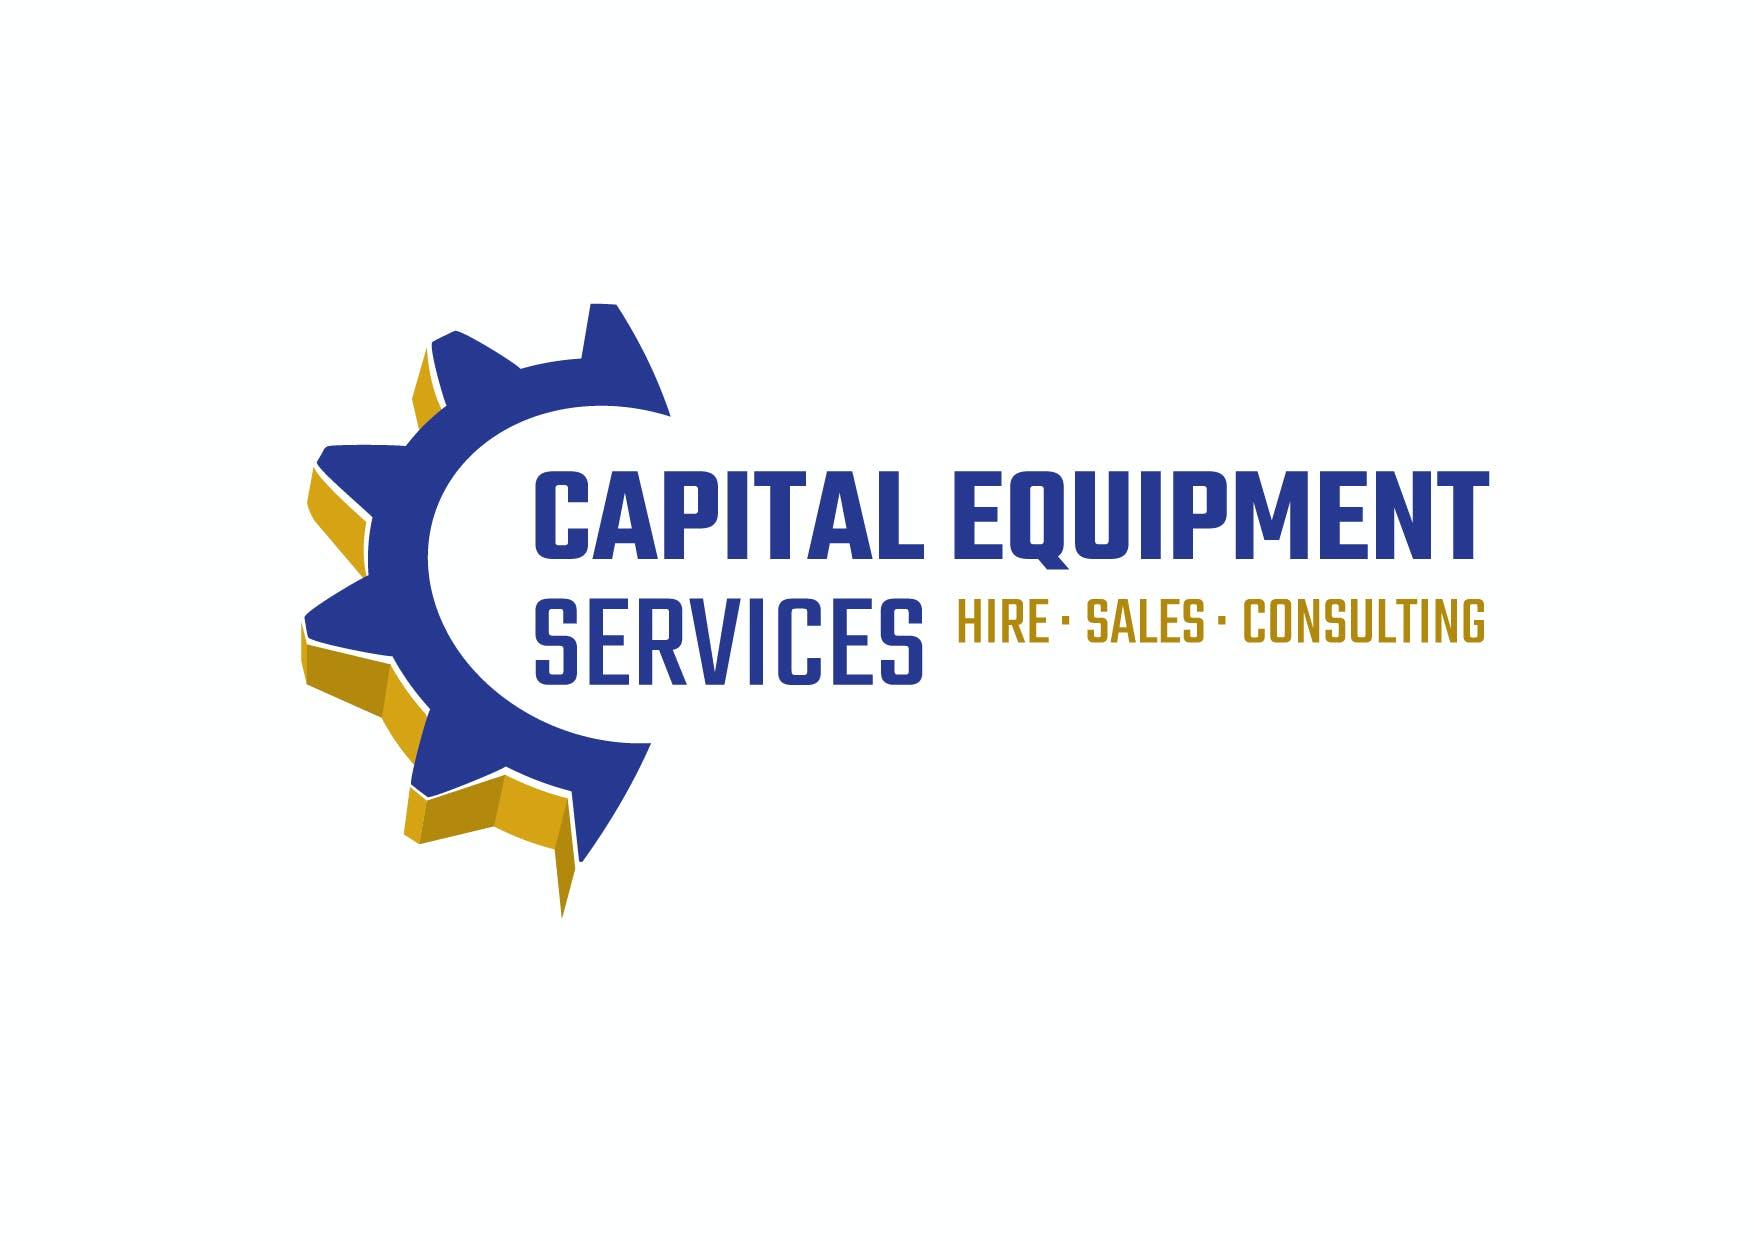 Capital Equipment Services